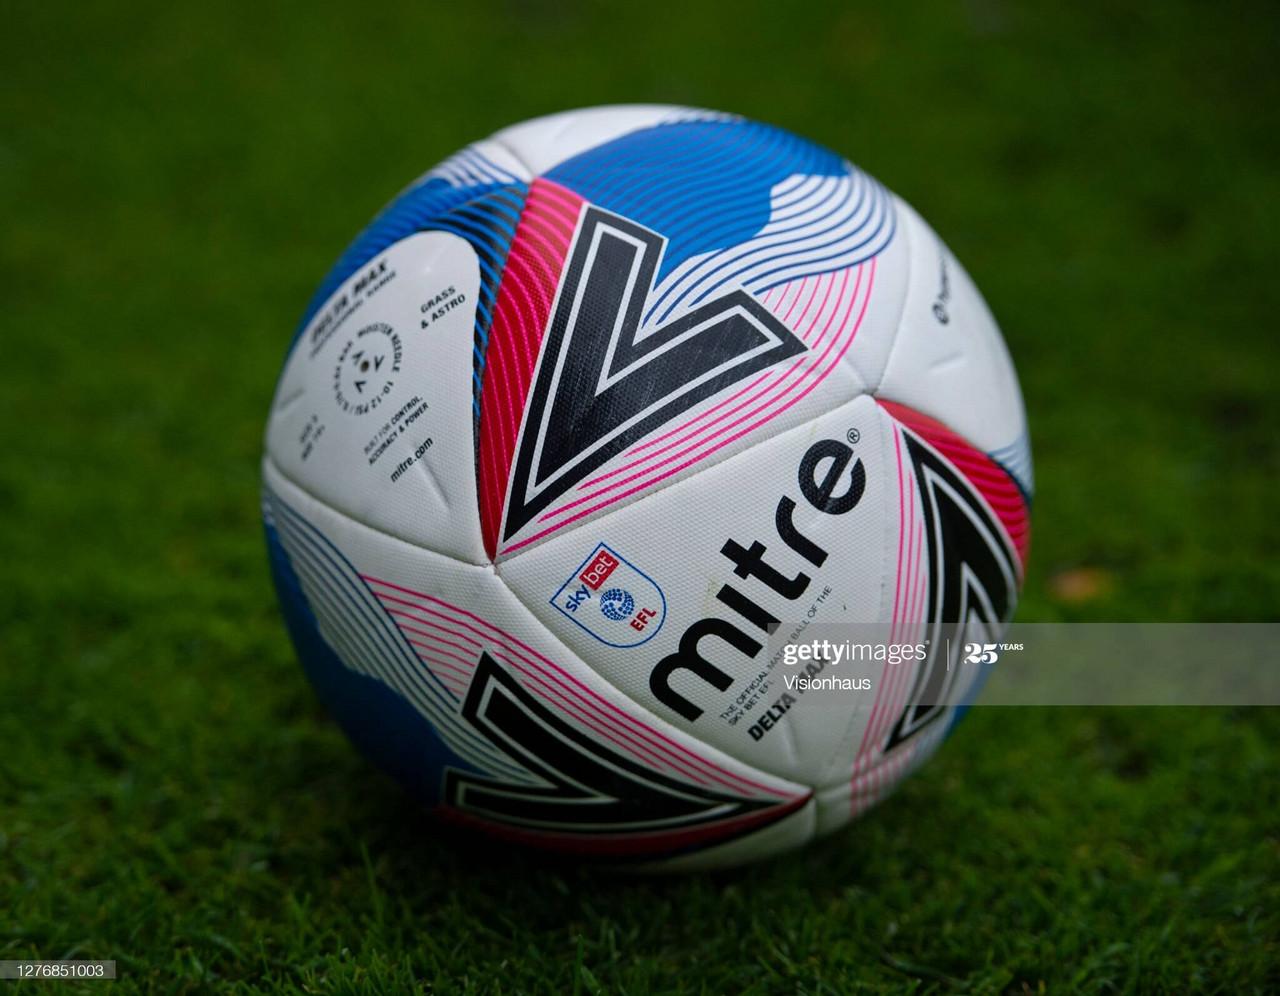 Tranmere Rovers 1-3 Walsall: McDonald stars as Saddlers end hosts' winning streak